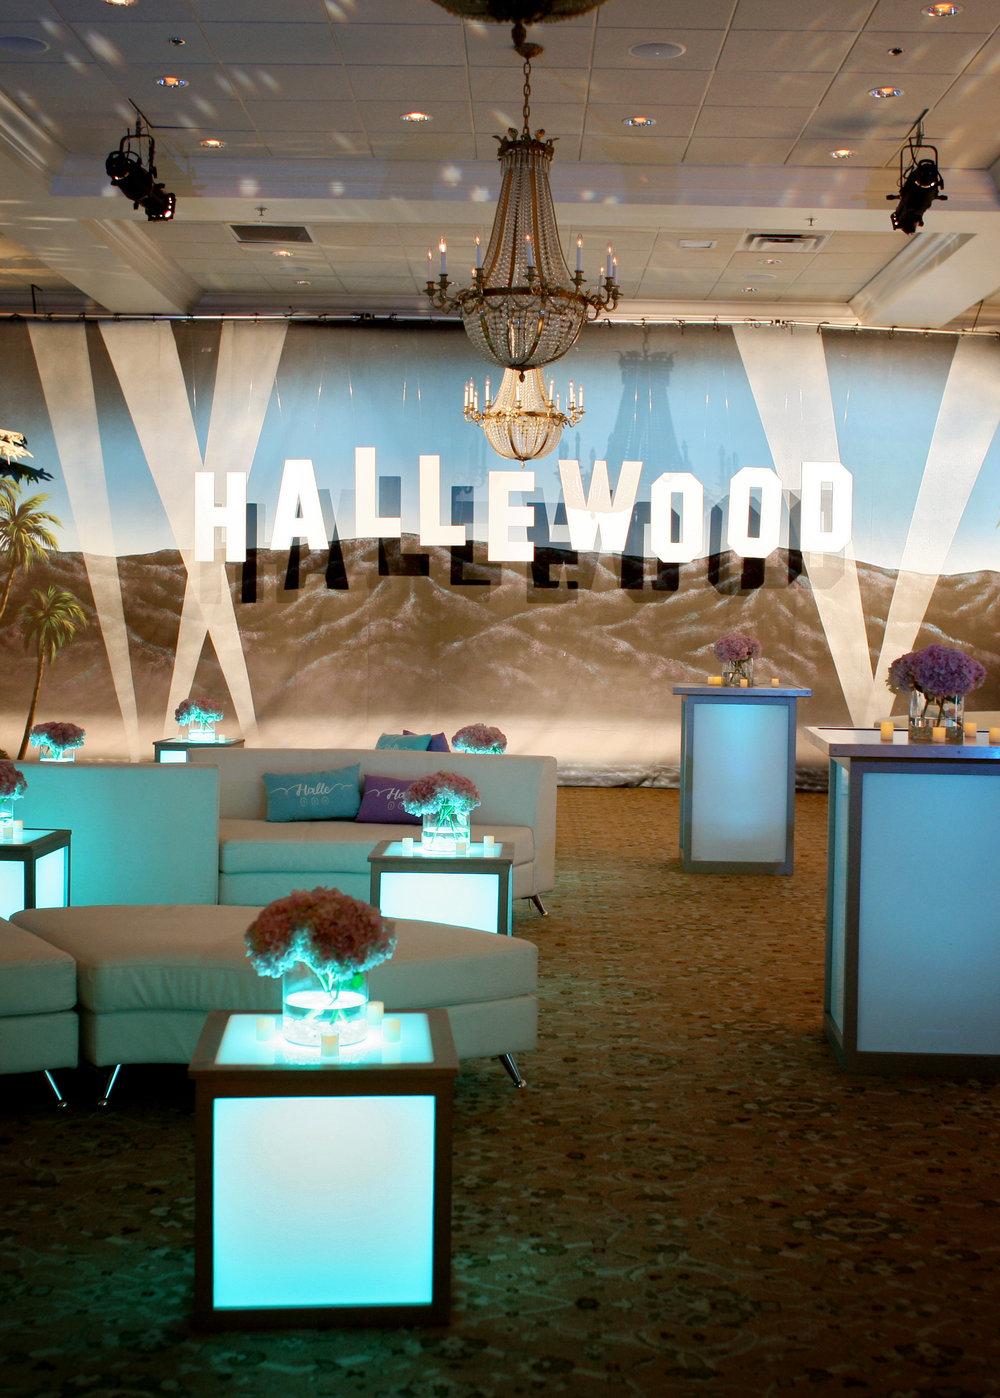 1Hallewood Hollywood Bar Bat Mitzvah theme Nashville.jpg